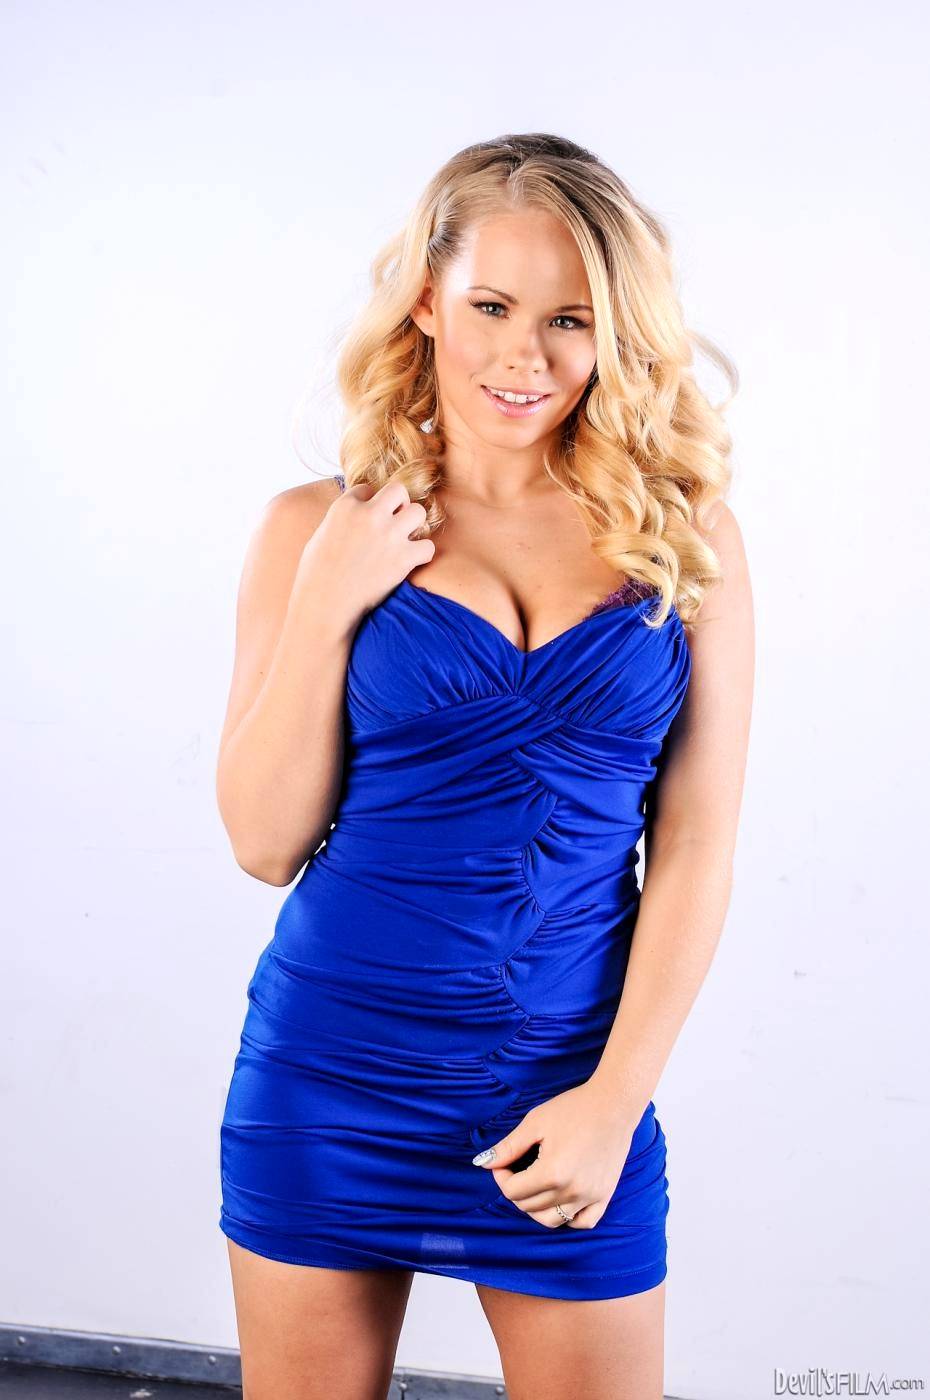 Devils Film Nina Hartley Britney Young Sex Blonde Trainer